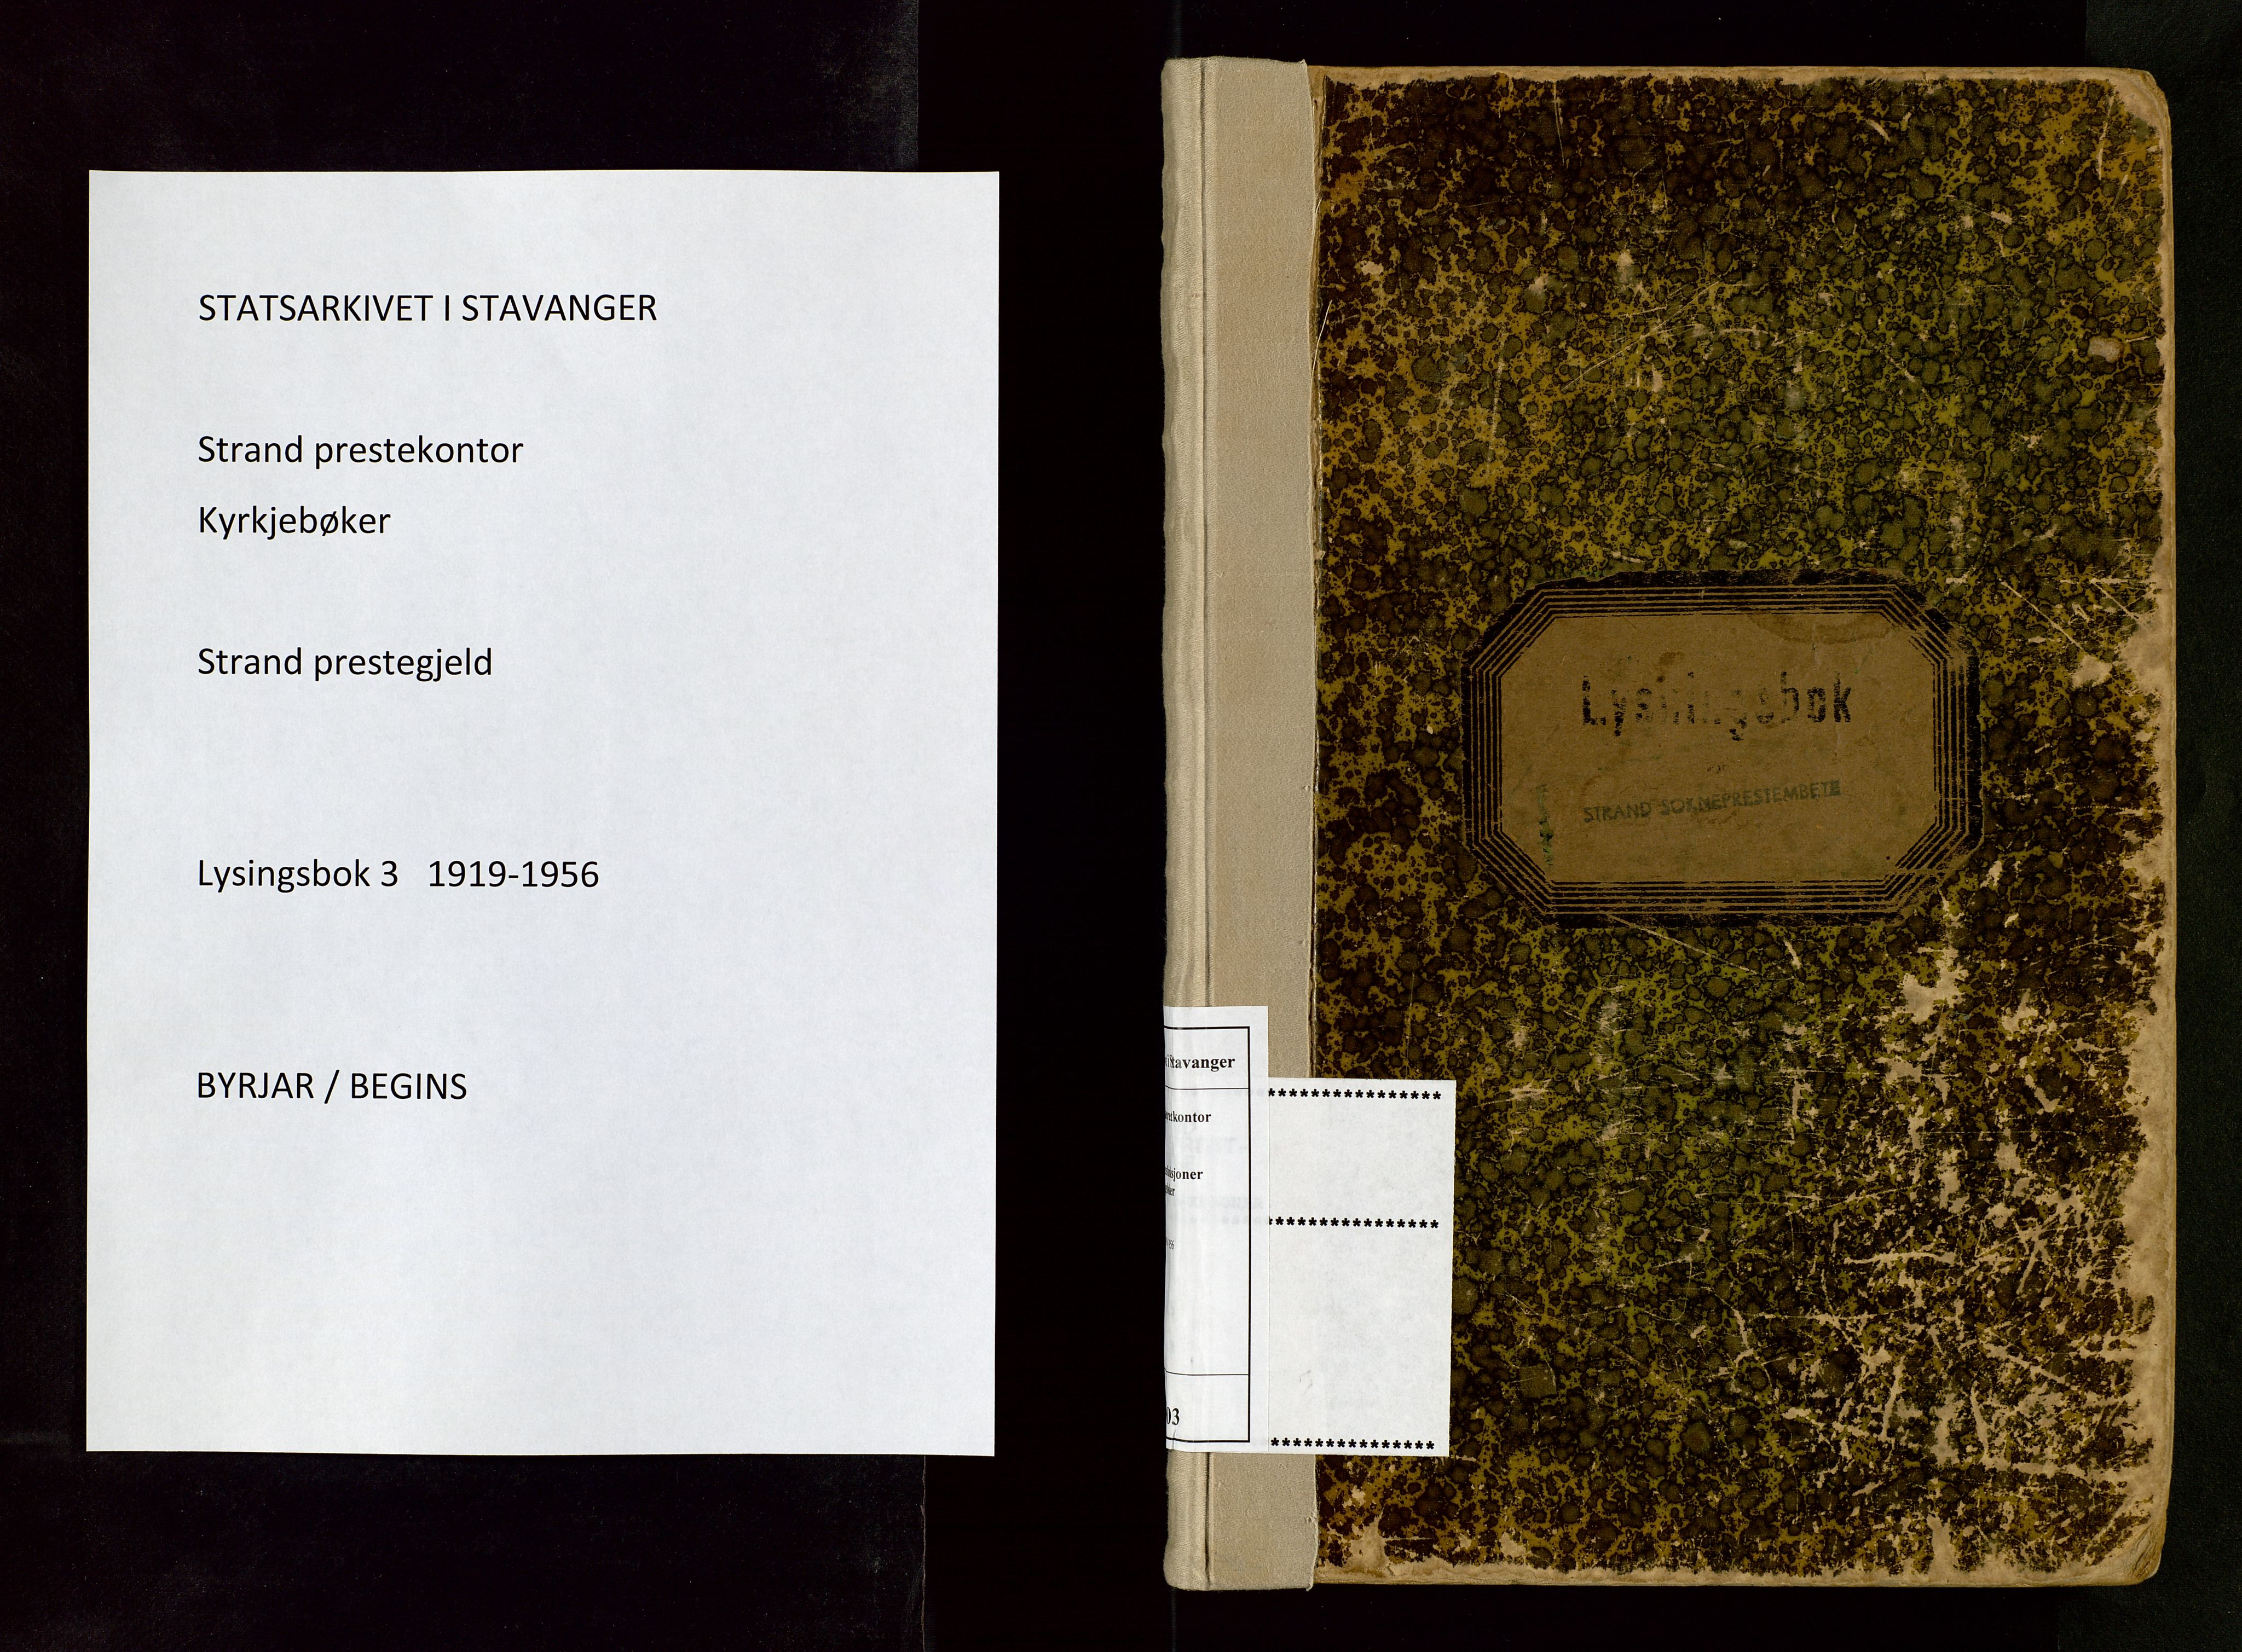 SAST, Strand sokneprestkontor, I/Ie/L0003: Banns register no. 3, 1919-1956